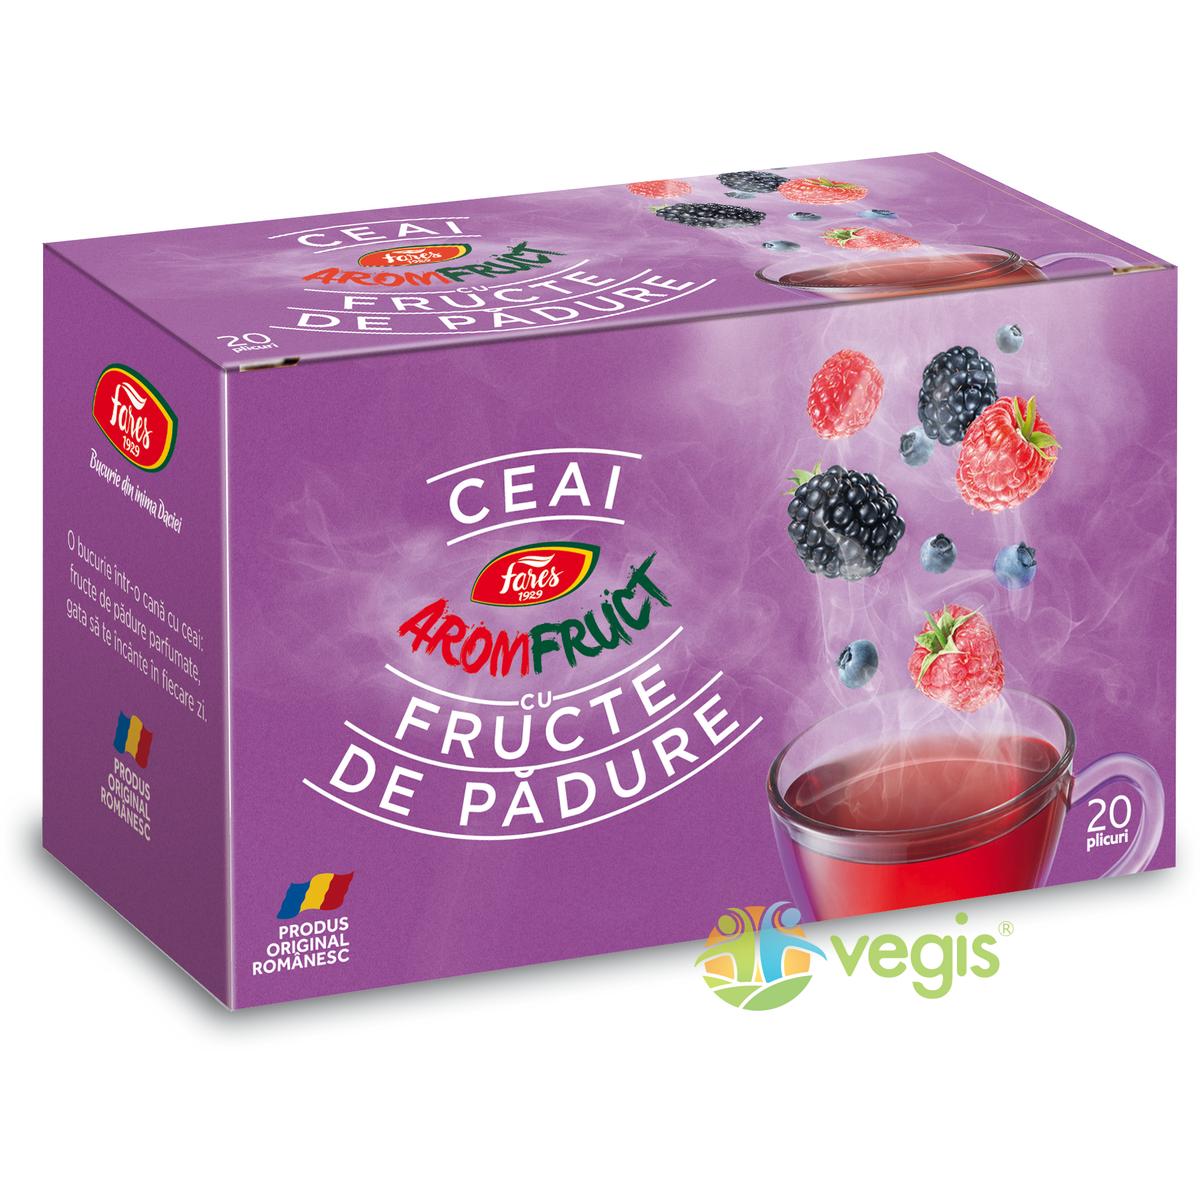 fares-ceai-aromfruct-fructe-de-padure-20dz-36002